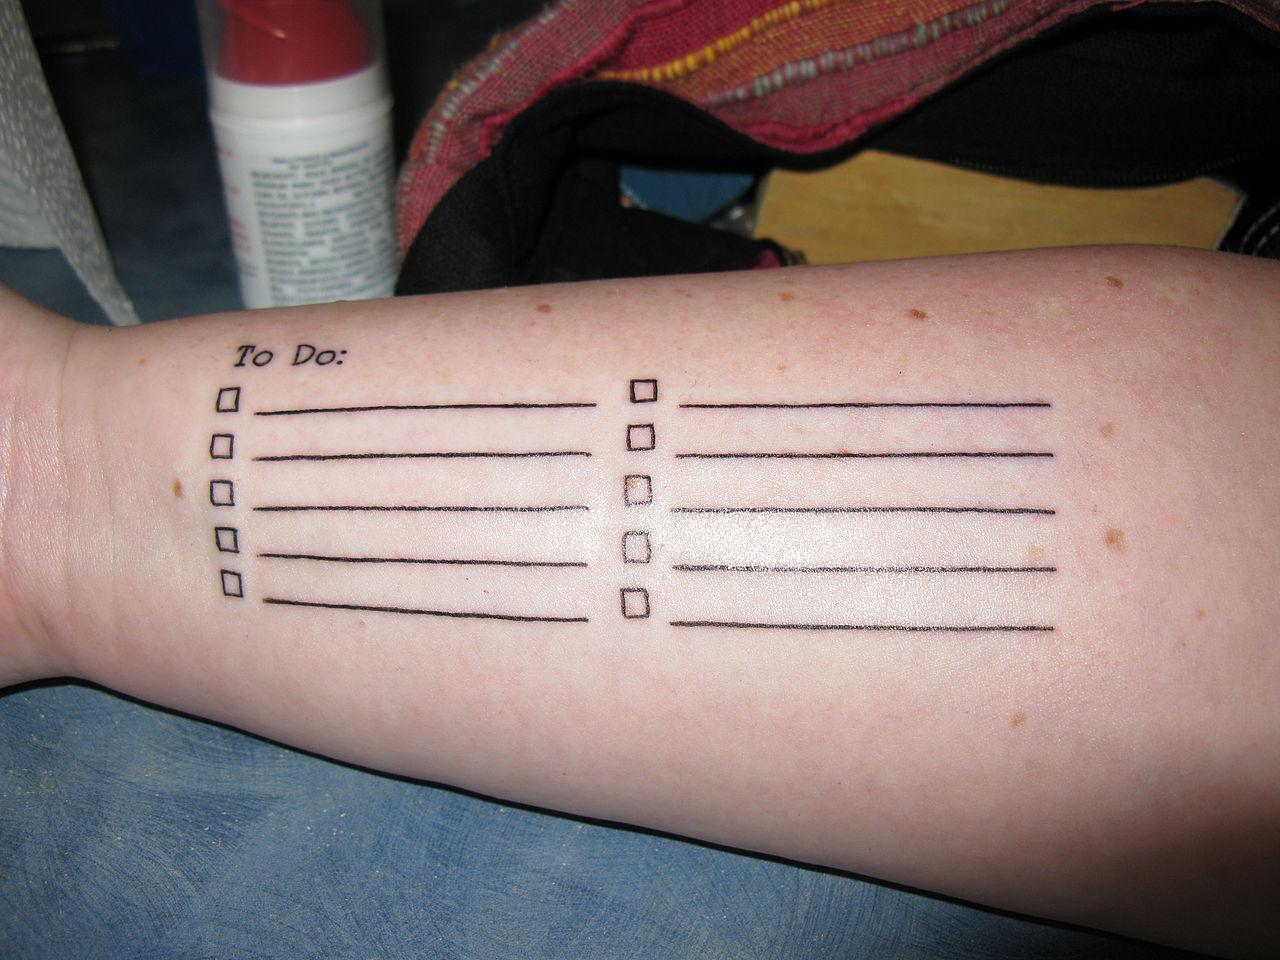 To do tattoo wikipedia insight meditation support to do tattoo wikipedia thecheapjerseys Choice Image